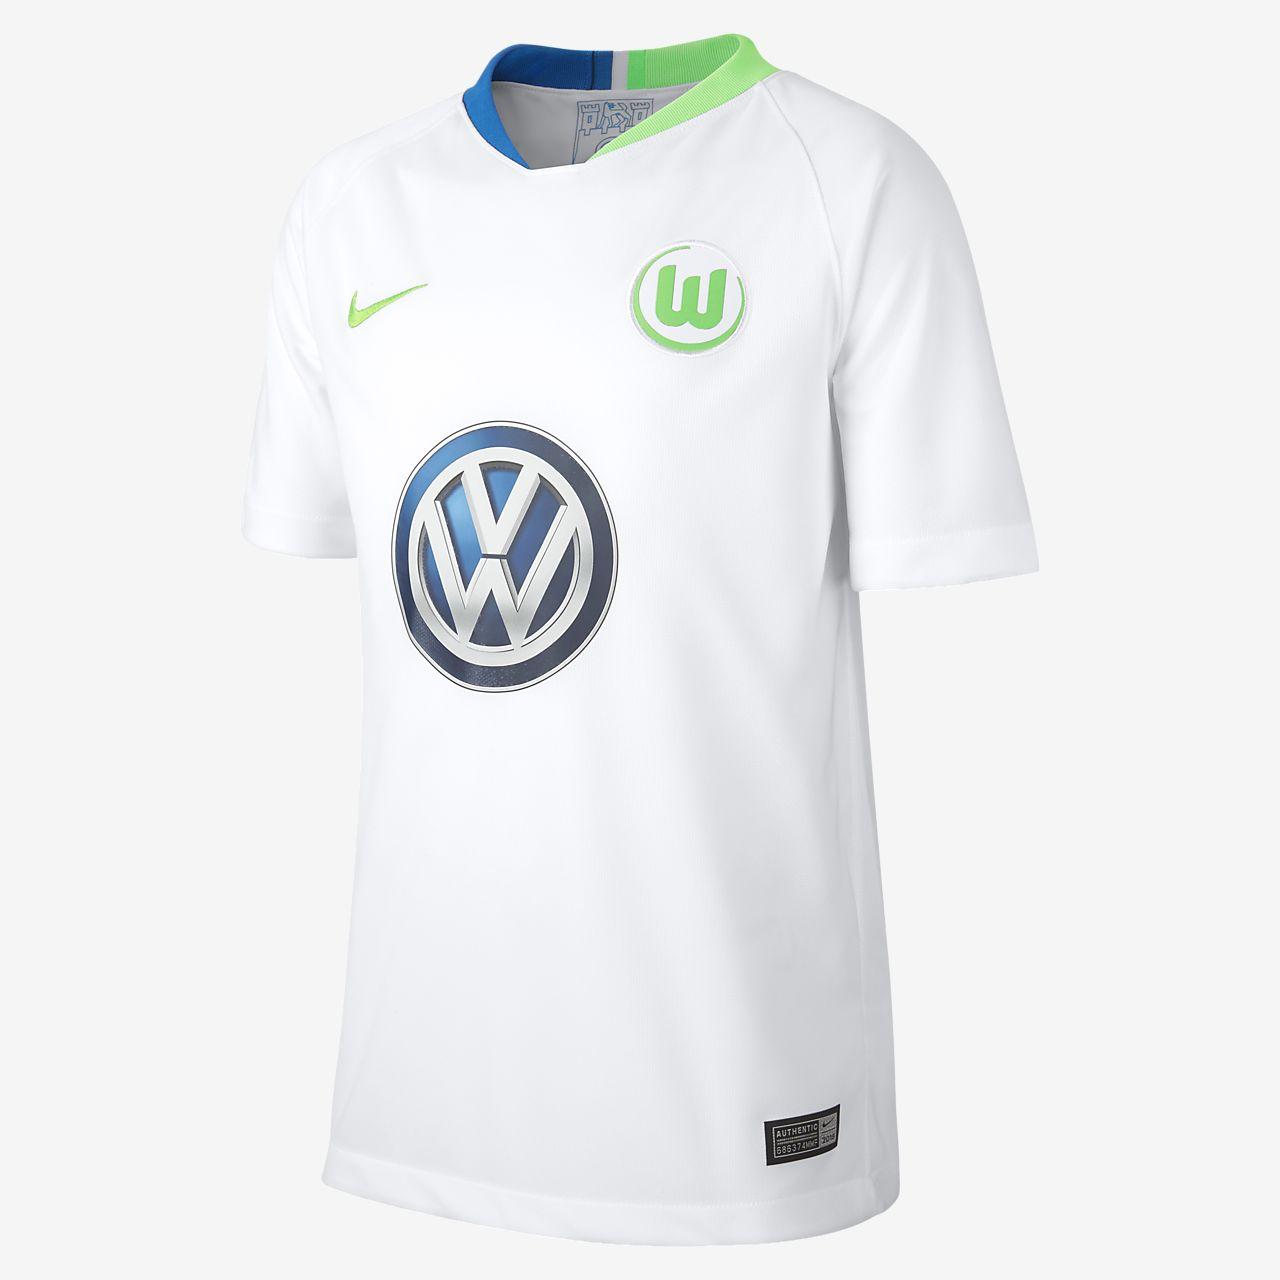 2018/19 VfL Wolfsburg Stadium Away Older Kids' Football Shirt